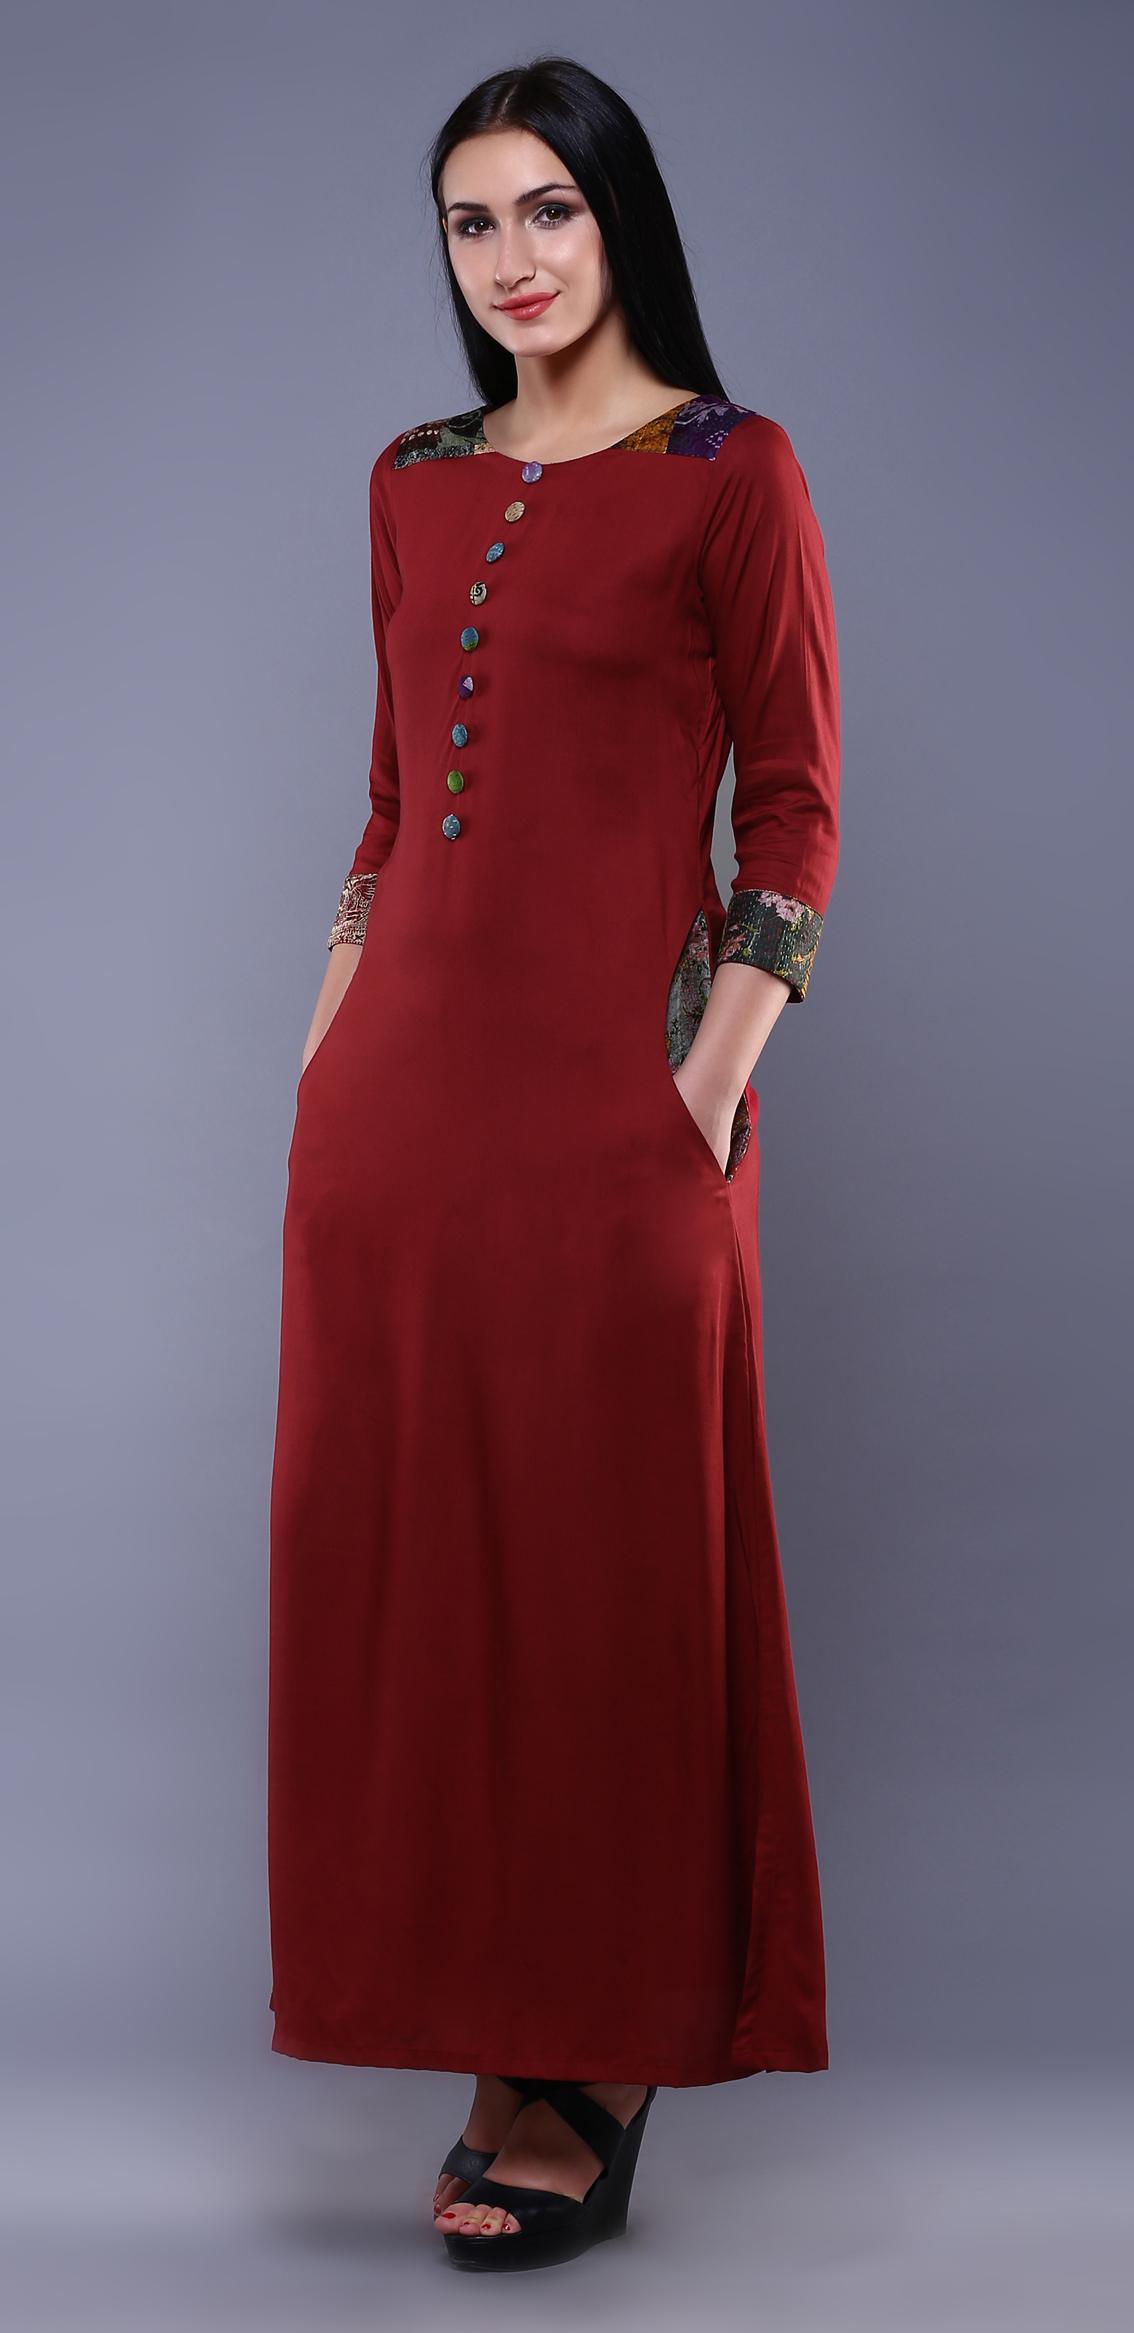 a403eab83b2 Maroon kantha dress - Dresses Women Apparel